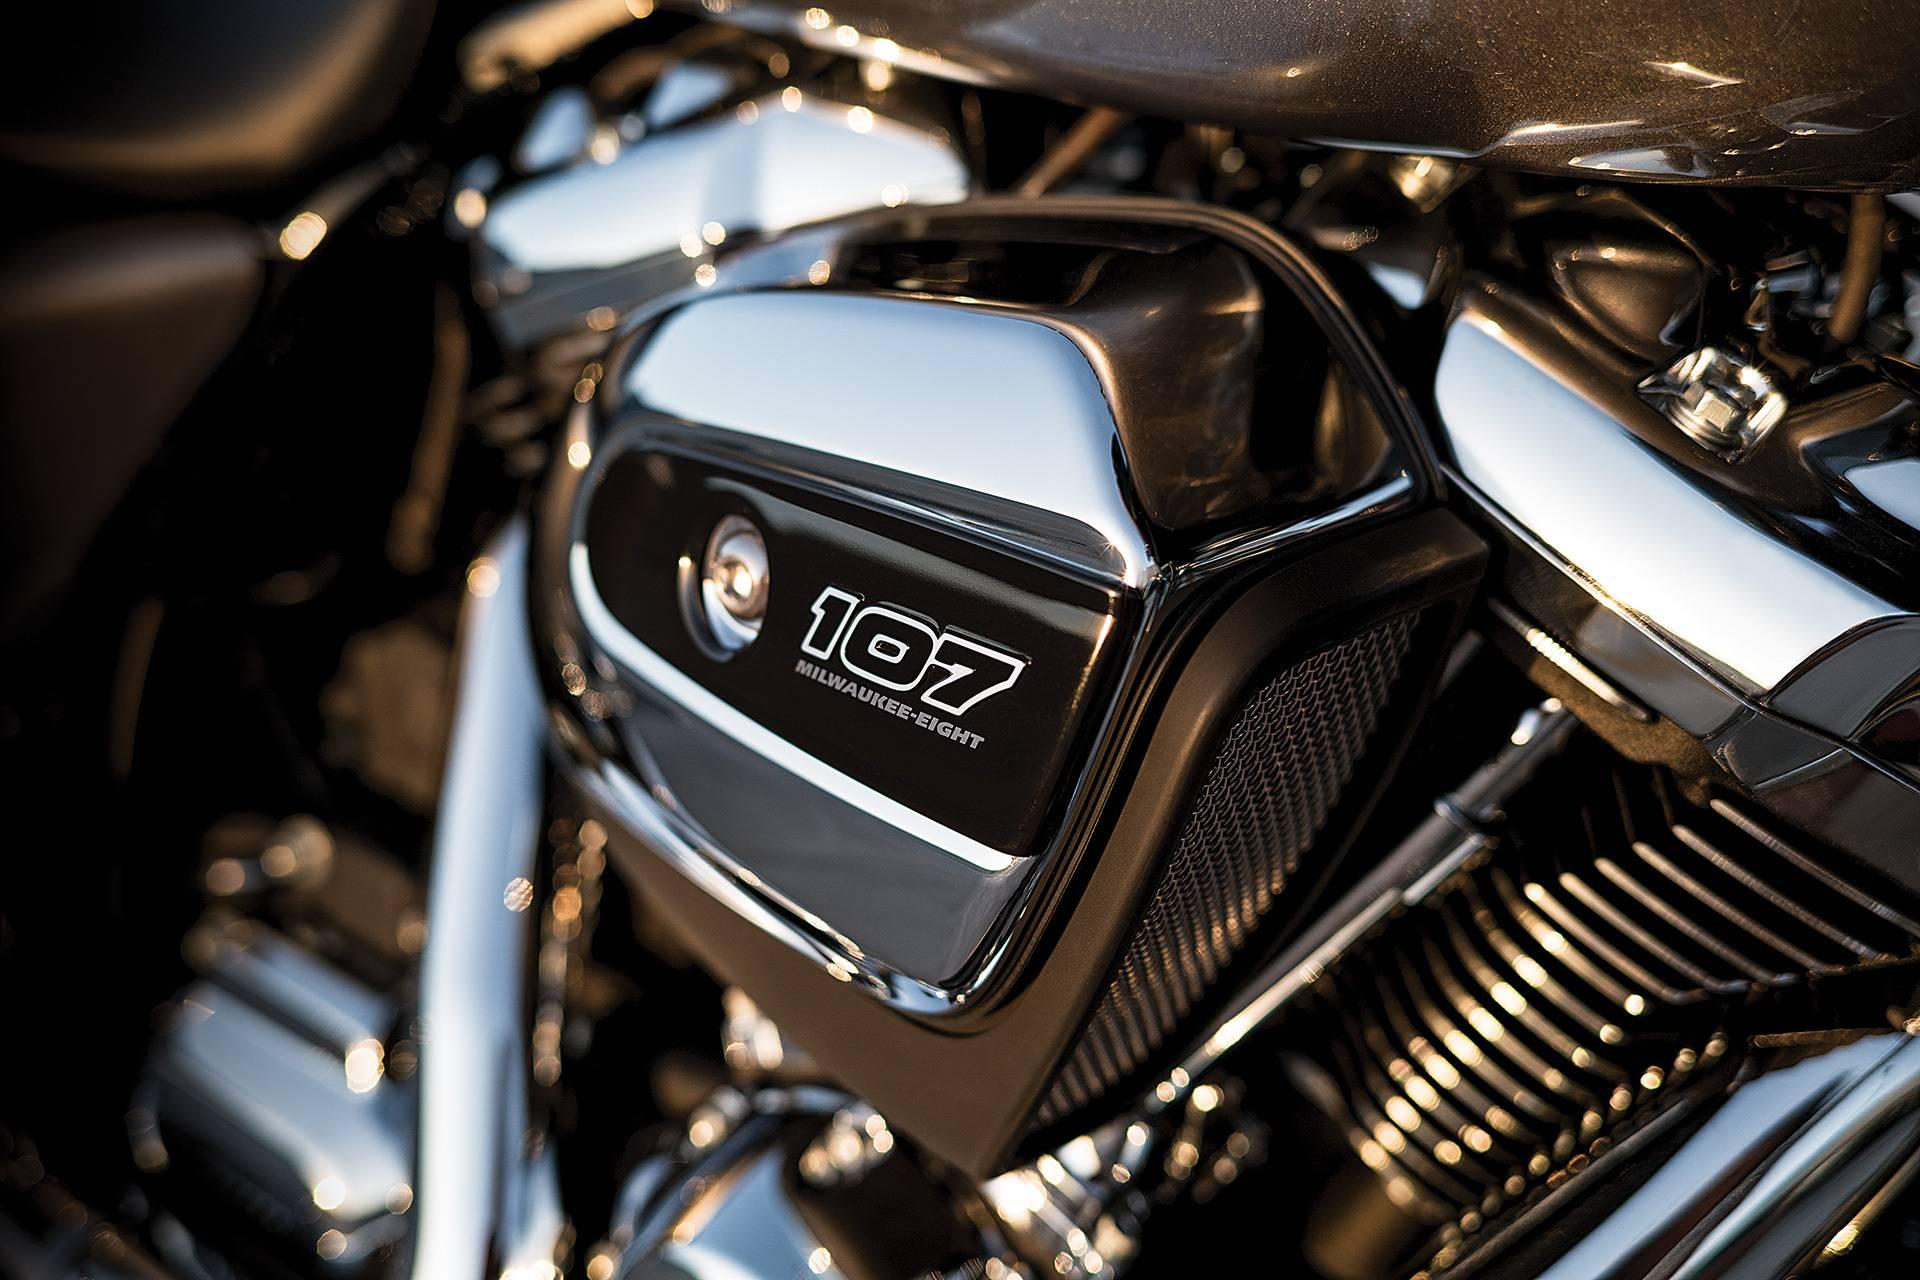 Harley-Davidson's New Milwaukee-Eight Big Twin Engine